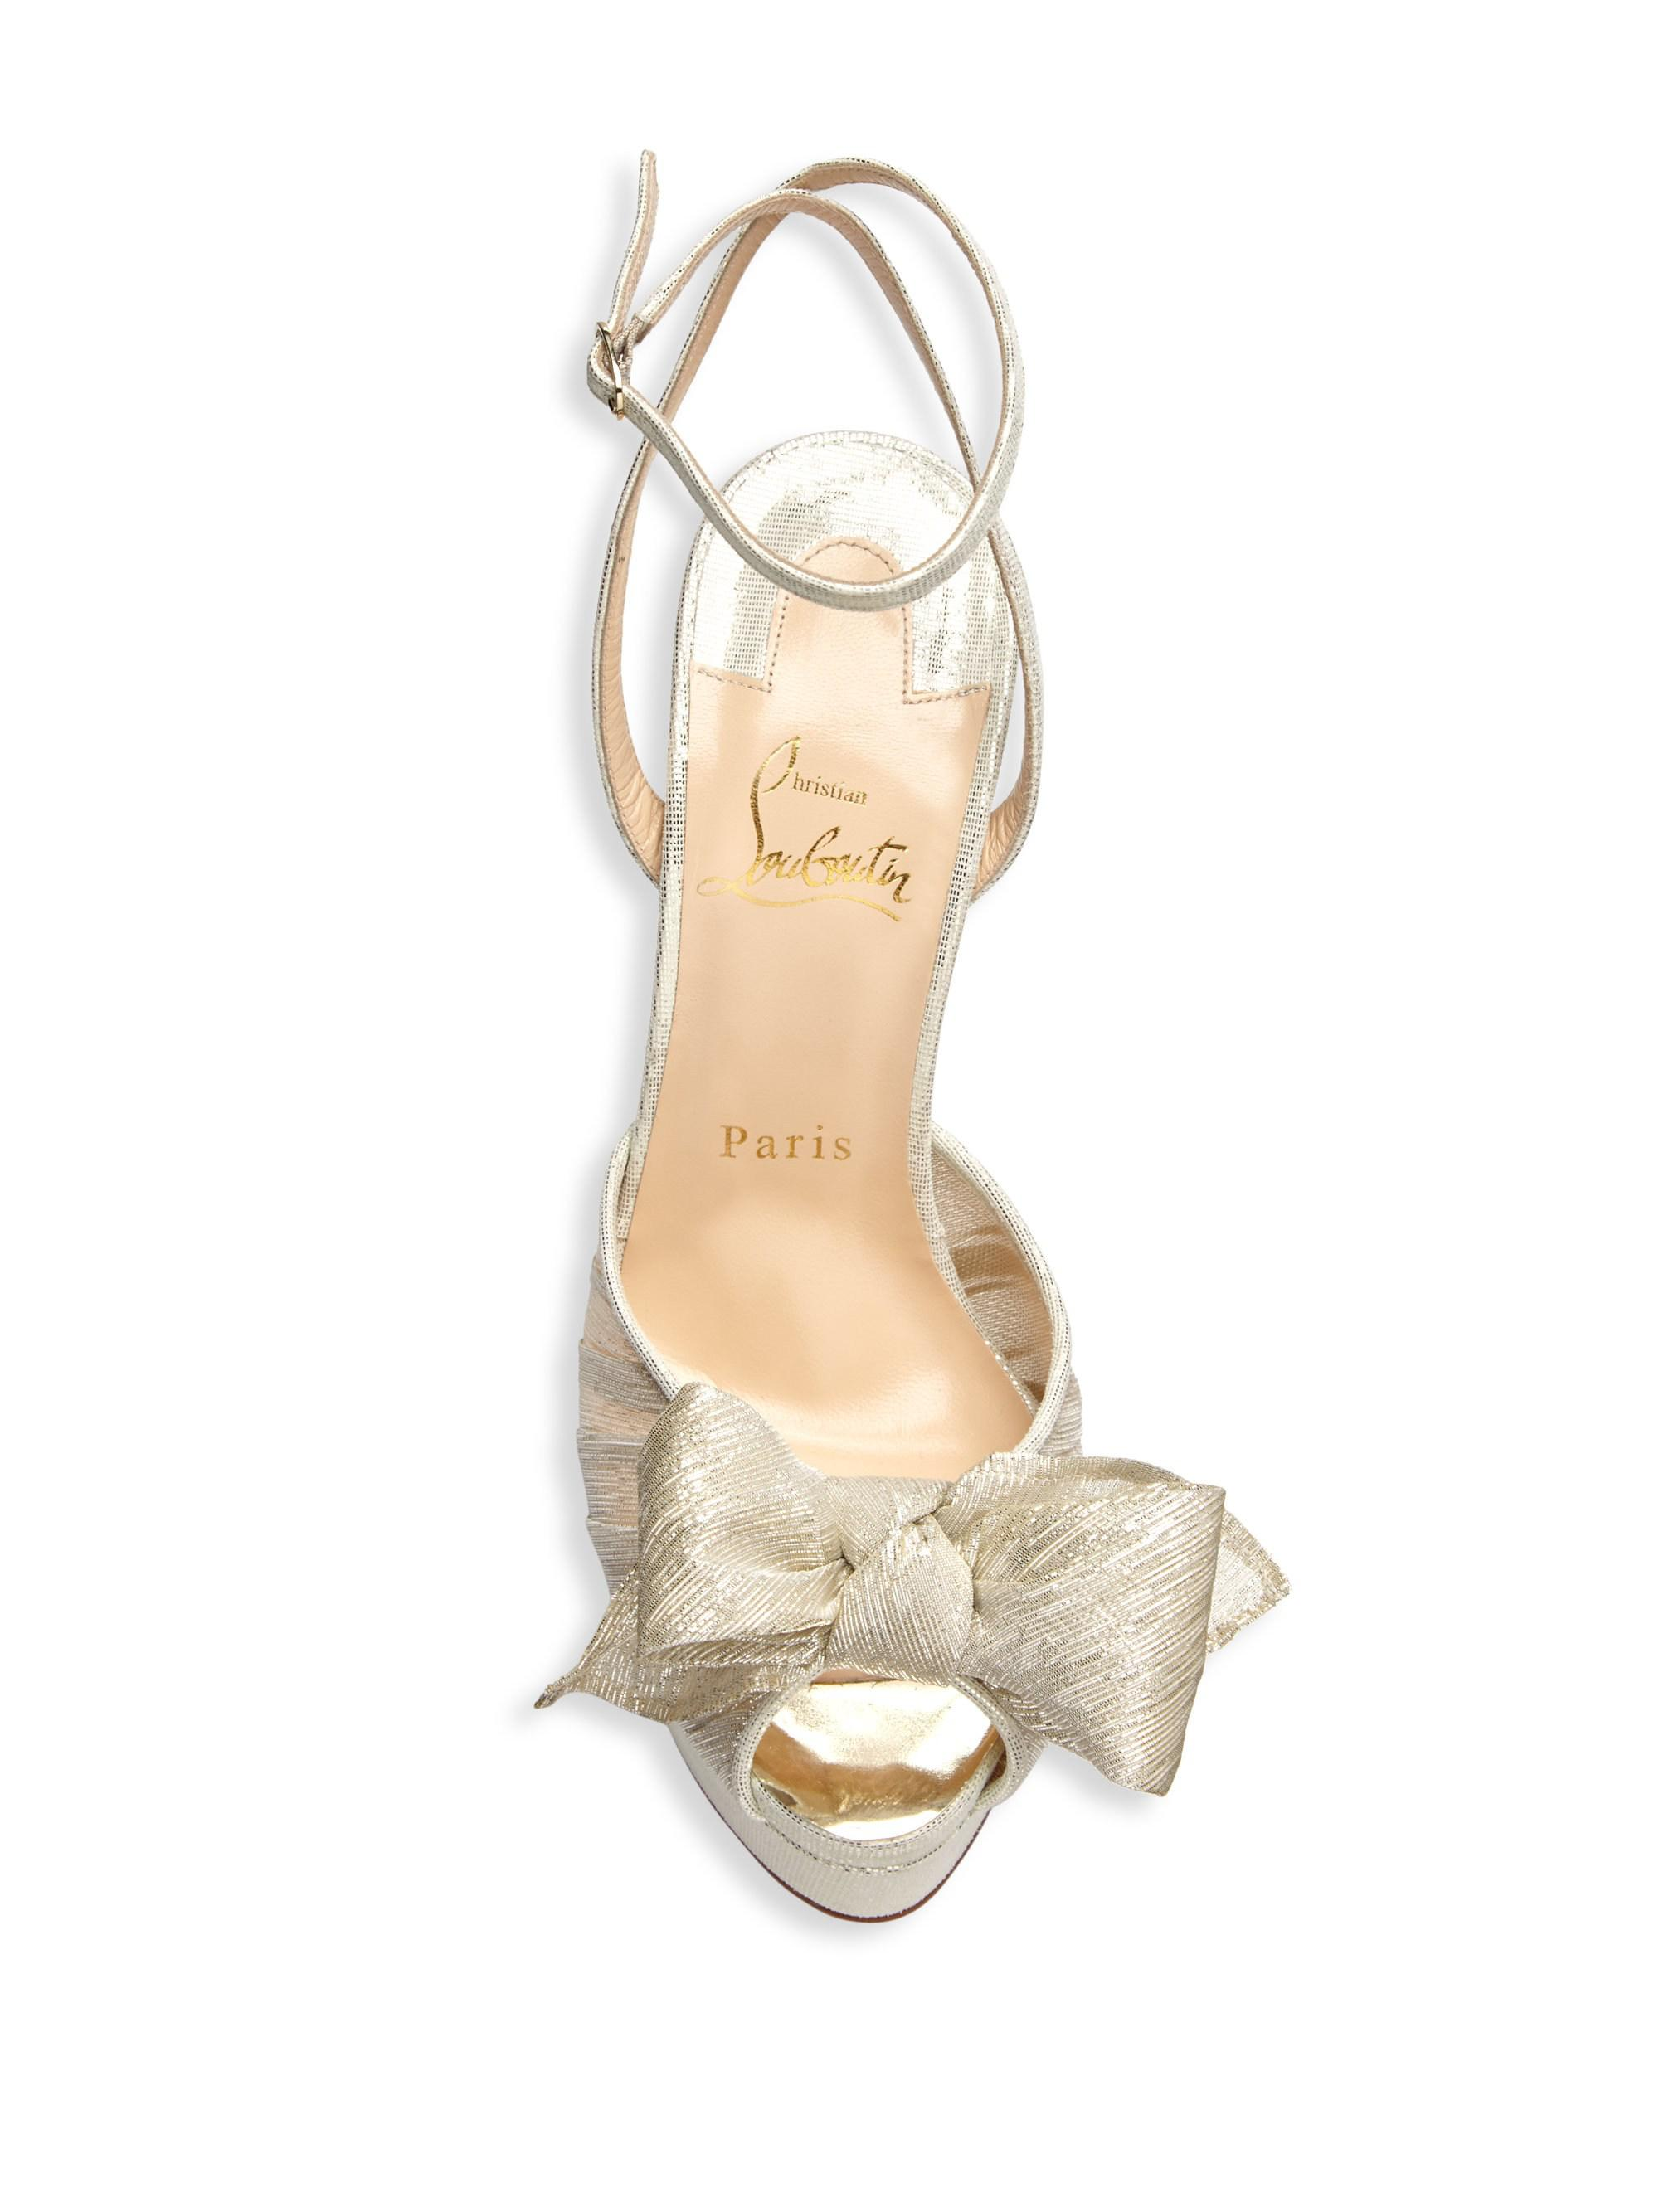 9e5b75fdb7 Christian Louboutin Artydiva 150 Platform Ankle-strap Sandals in ...